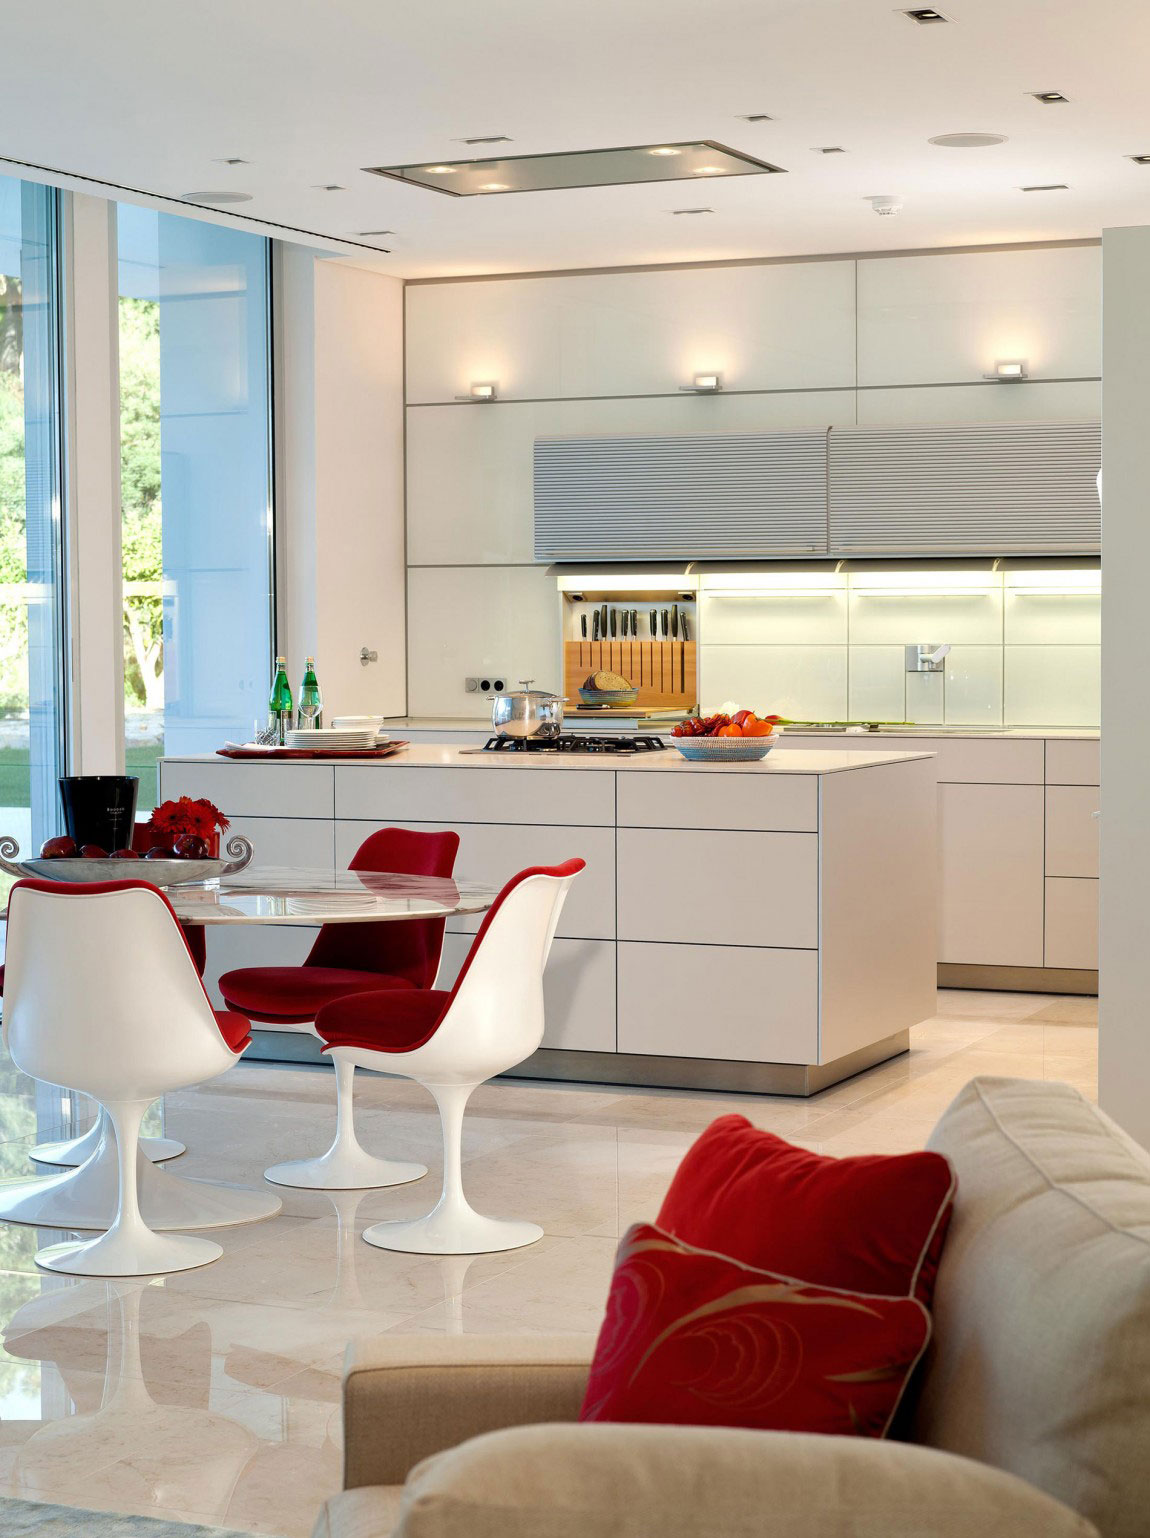 Kitchen-Interior-Design-Gallery-9 Kitchen-Interior Design-Gallery full of amazing examples